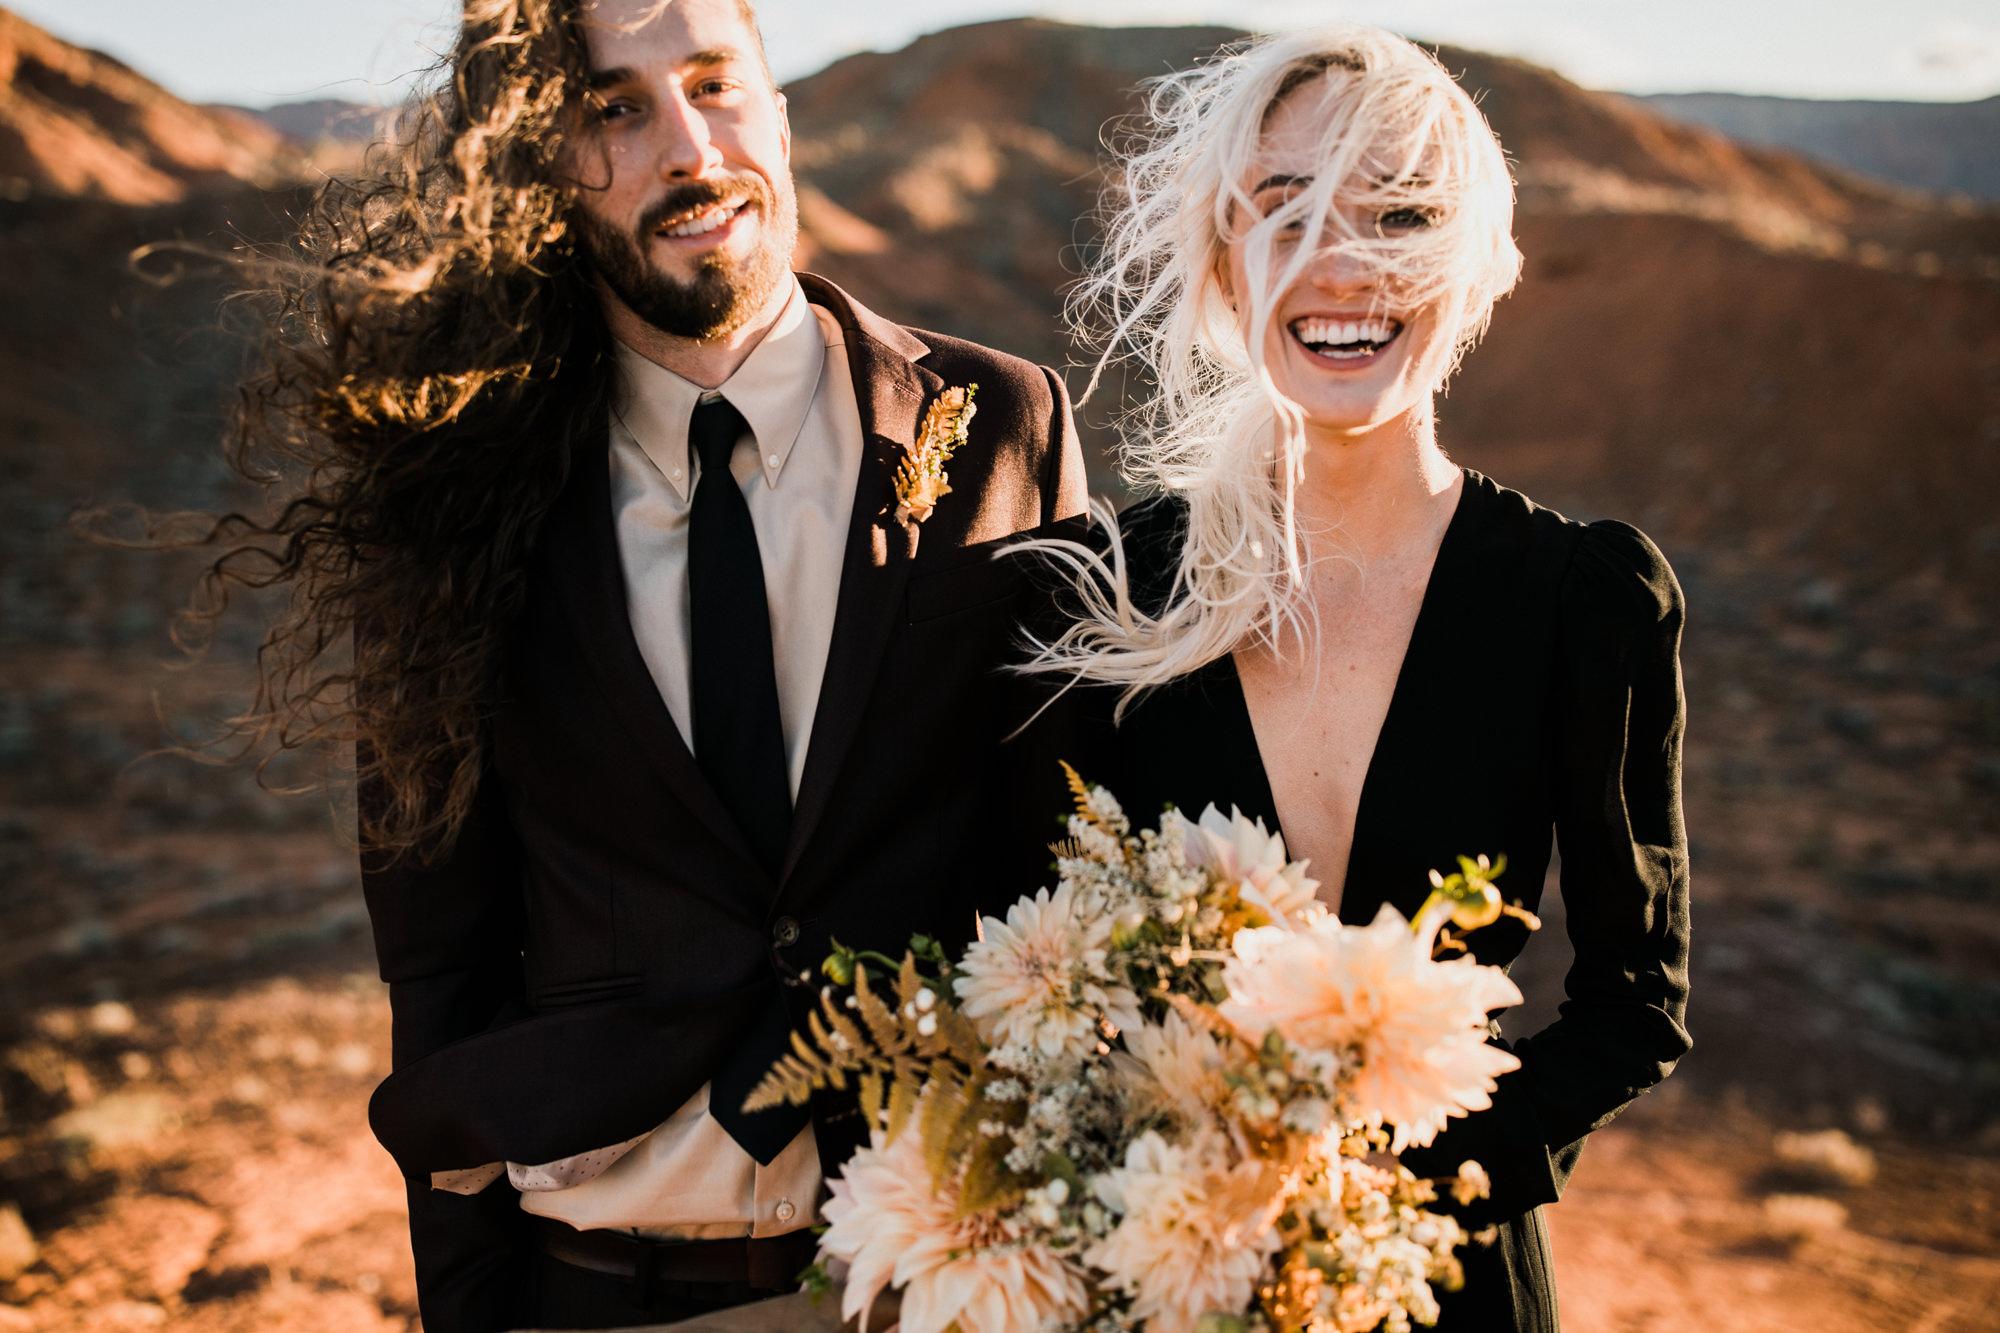 elopement in moab, utah + black wedding dress | destination adventure wedding photographers | the hearnes adventure photography | www.thehearnes.com